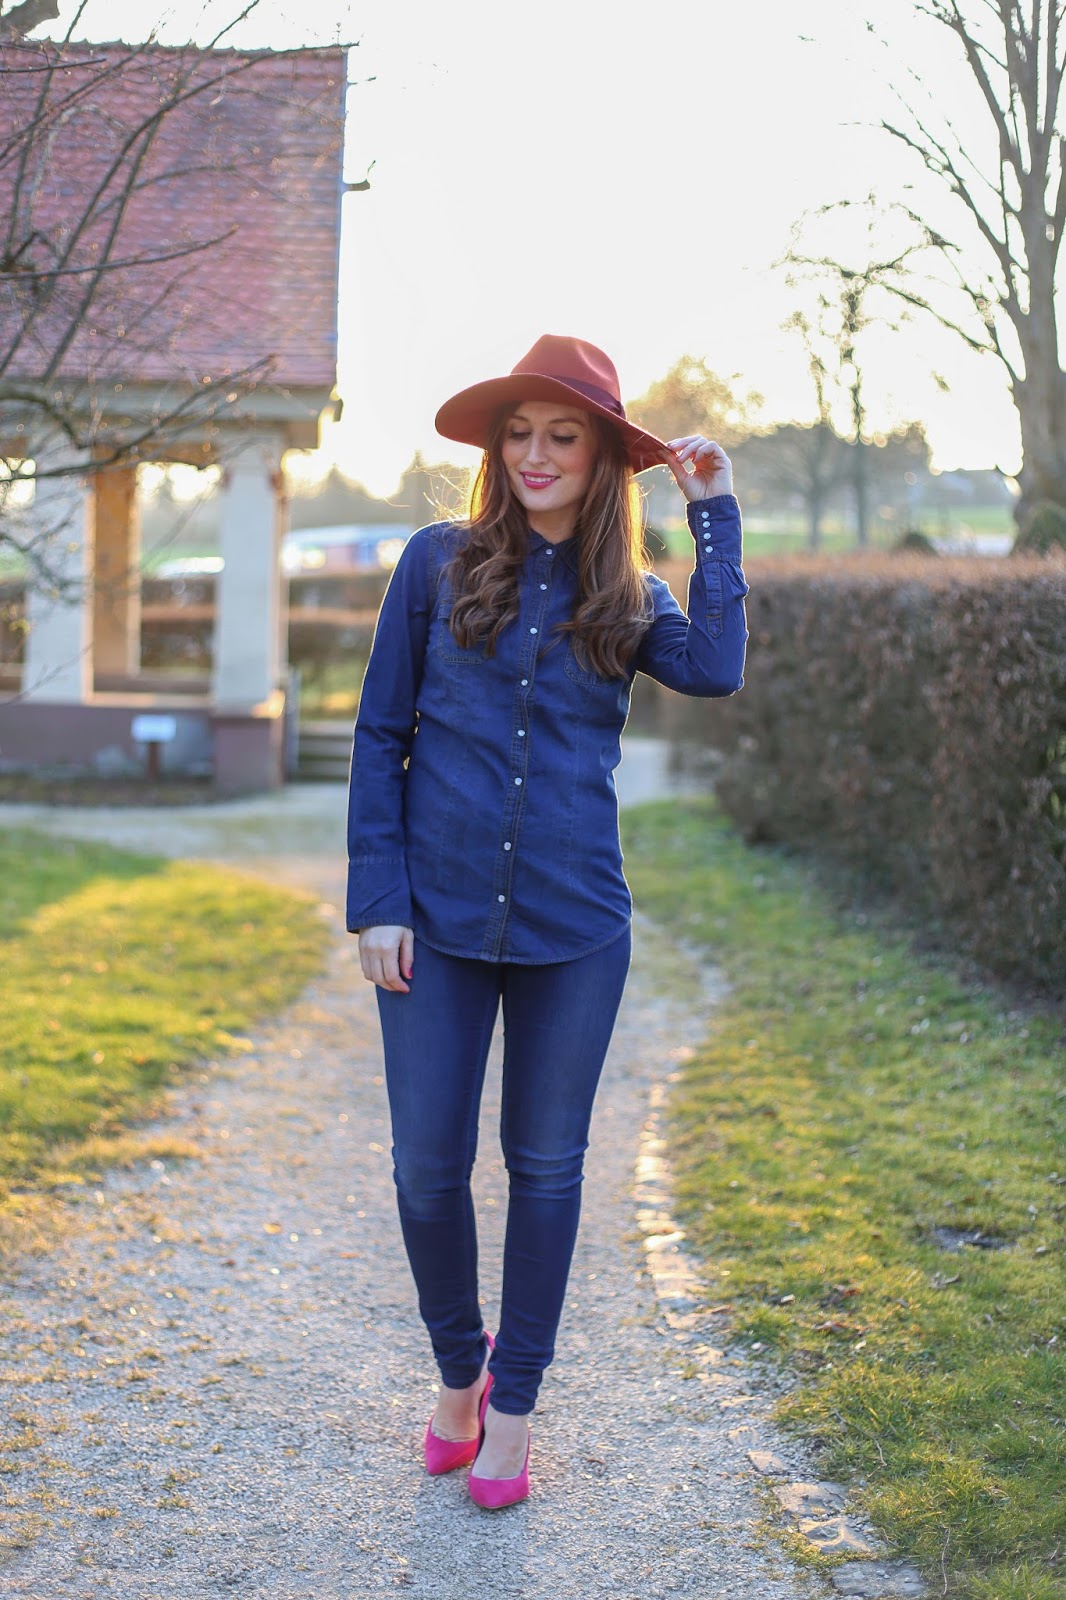 Fashionblogger aus Frankfurt - Frankfurt Fashionblogger - Modeblogger aus Deutschland - Fashionstylebyjohanna - Fashionblogger mit Hut